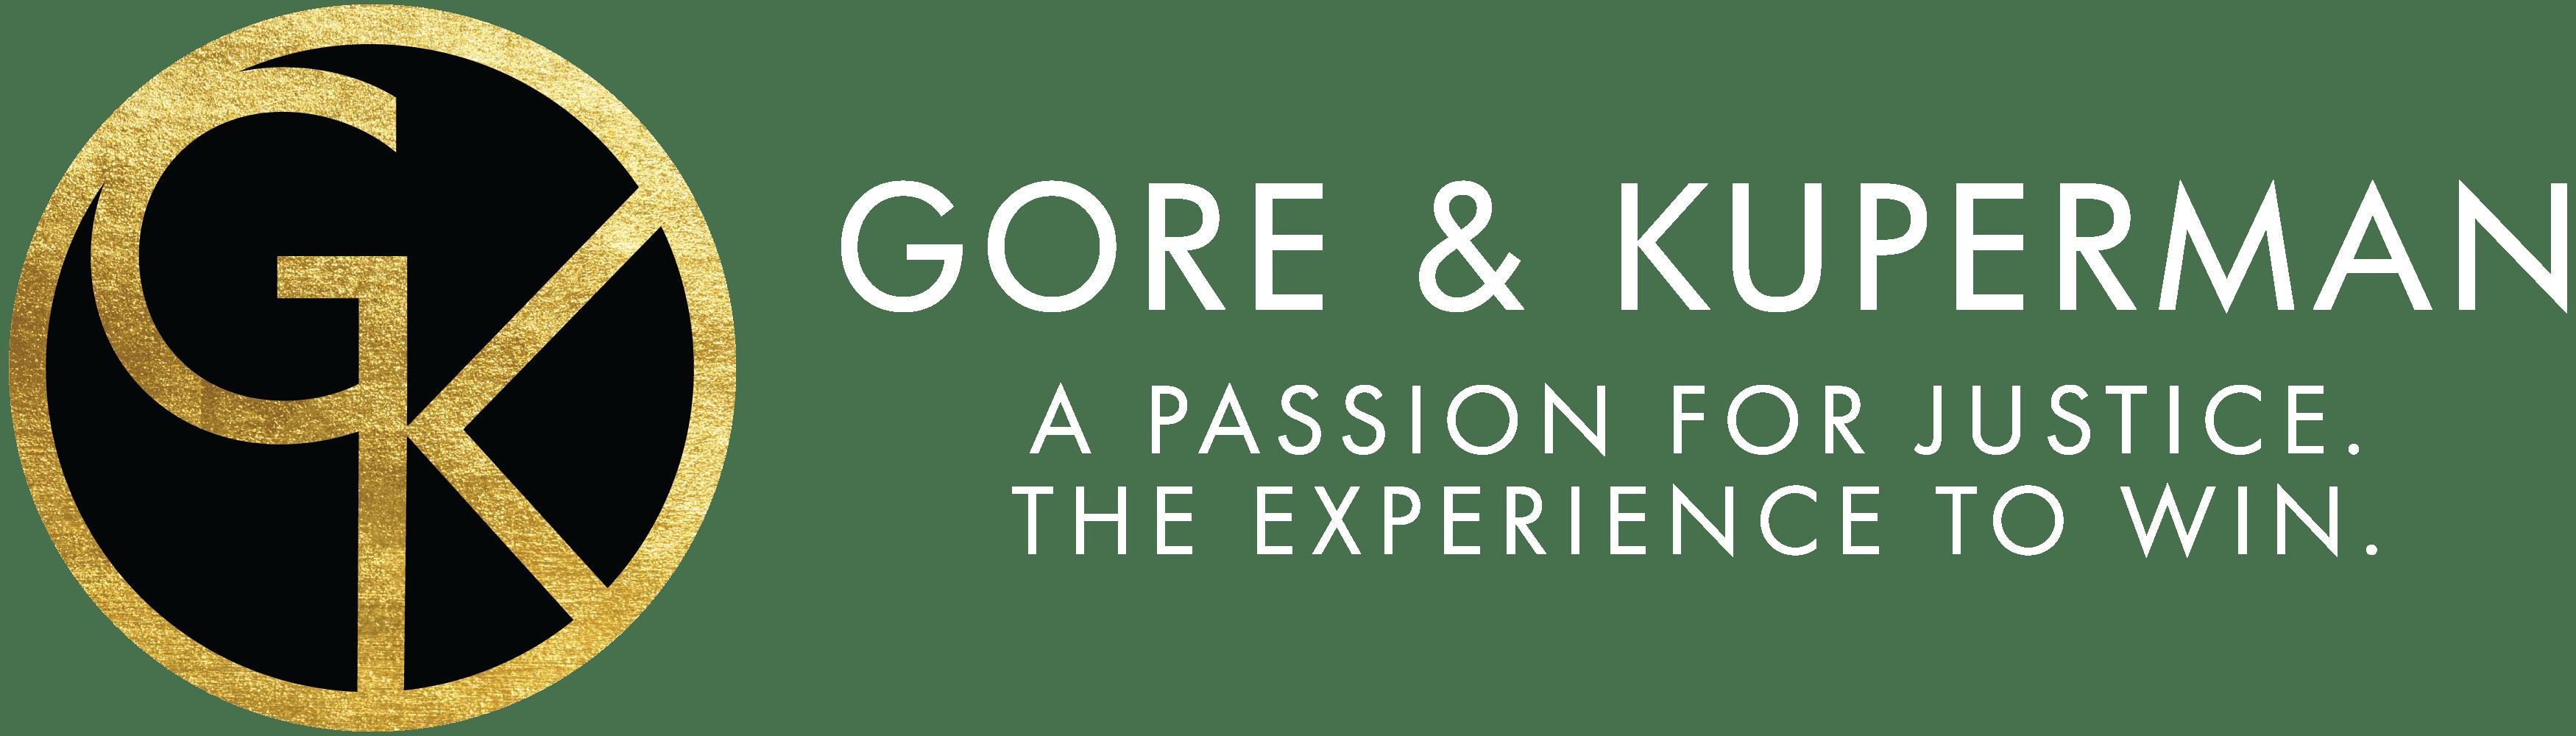 Gore & Kuperman